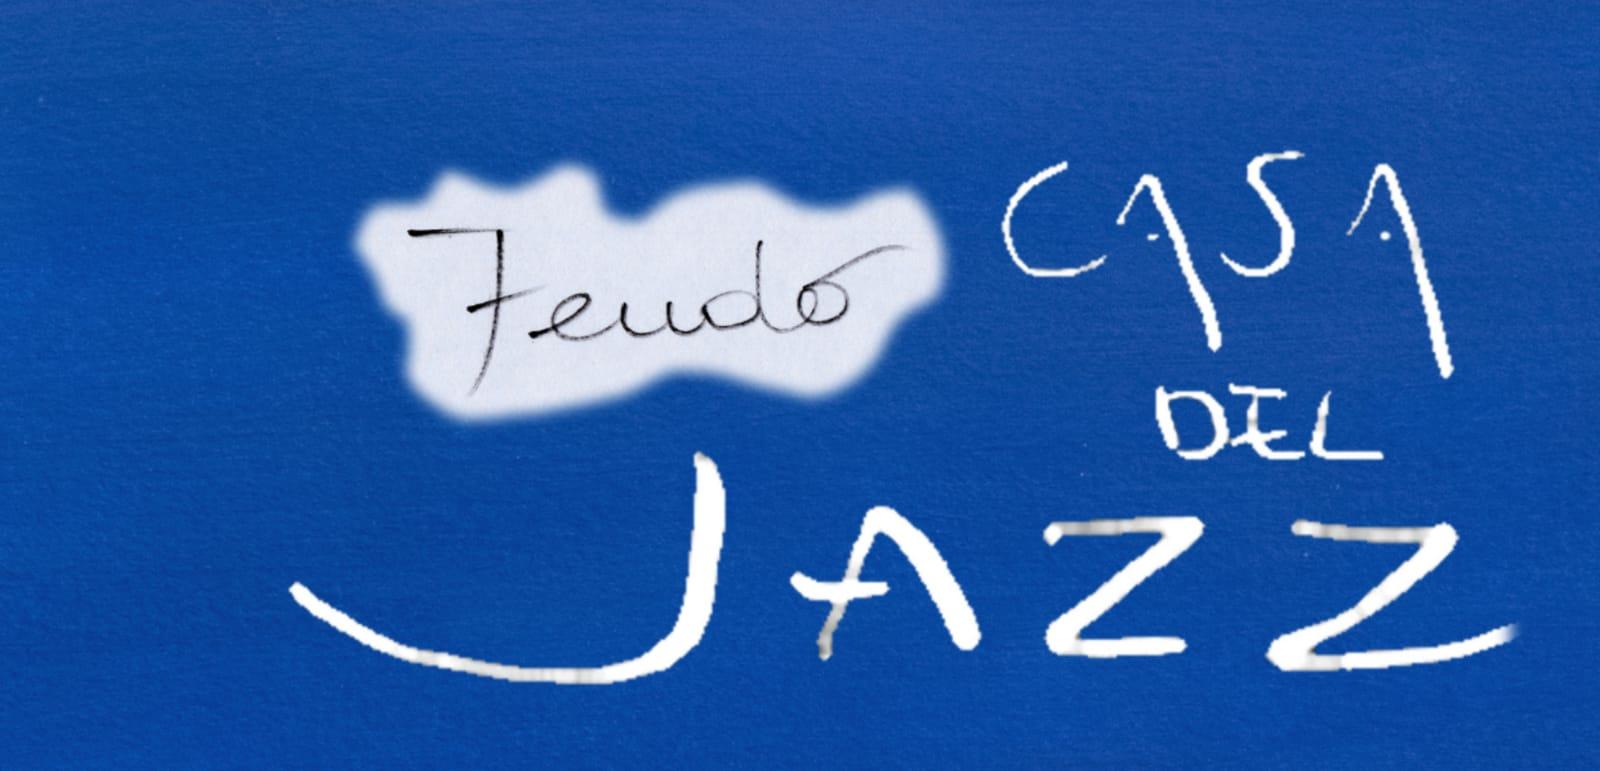 L'Estate del jazz ai tempi del Coronavirus – Feudo Casa del Jazz